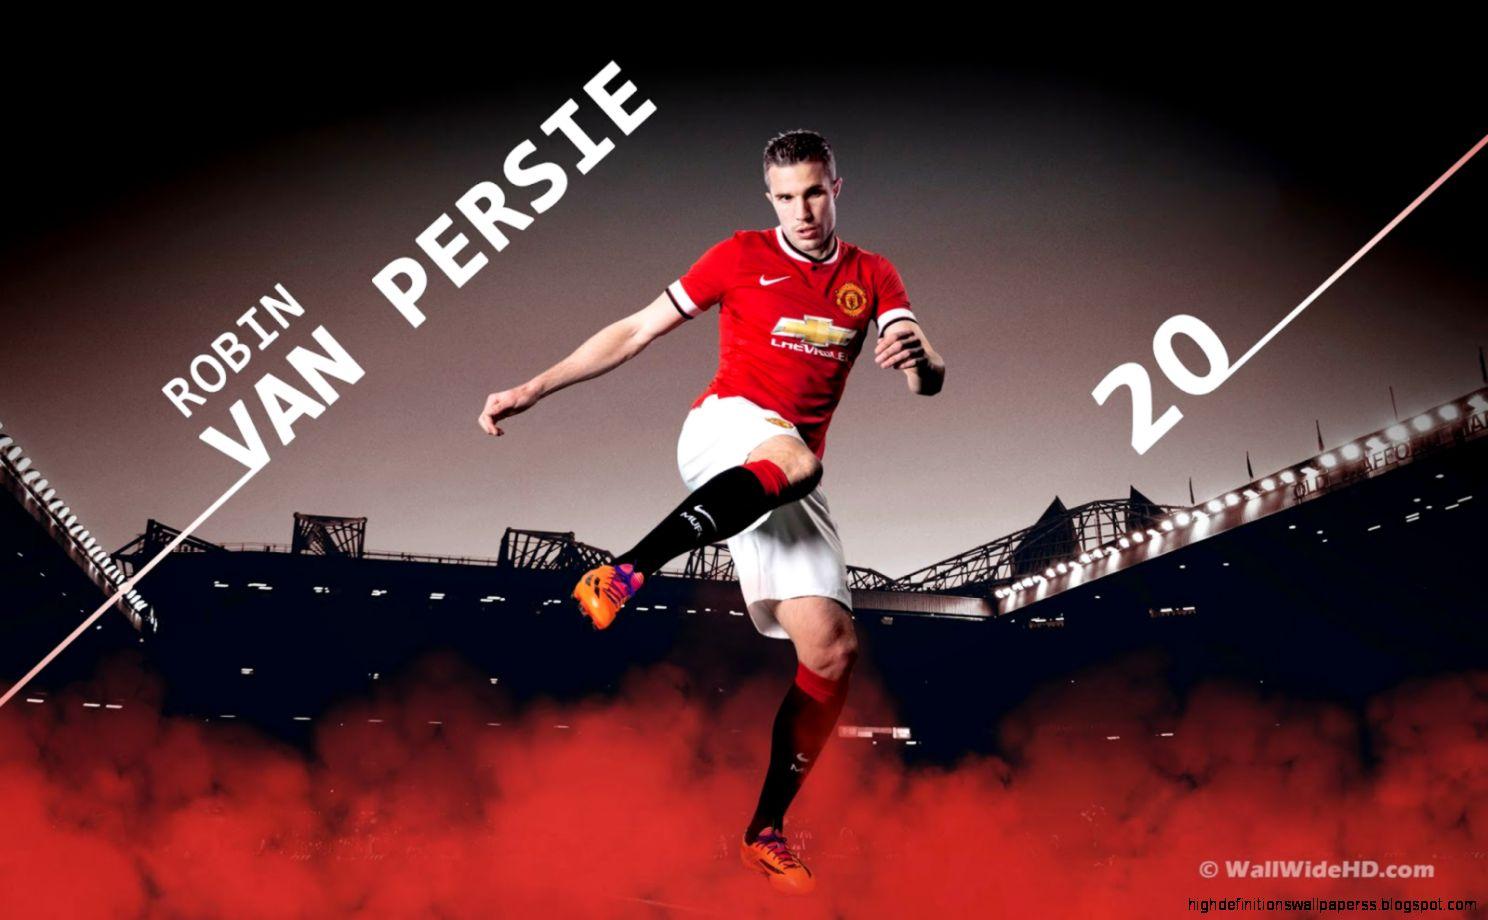 wallpaper manchester united player robin van persie high